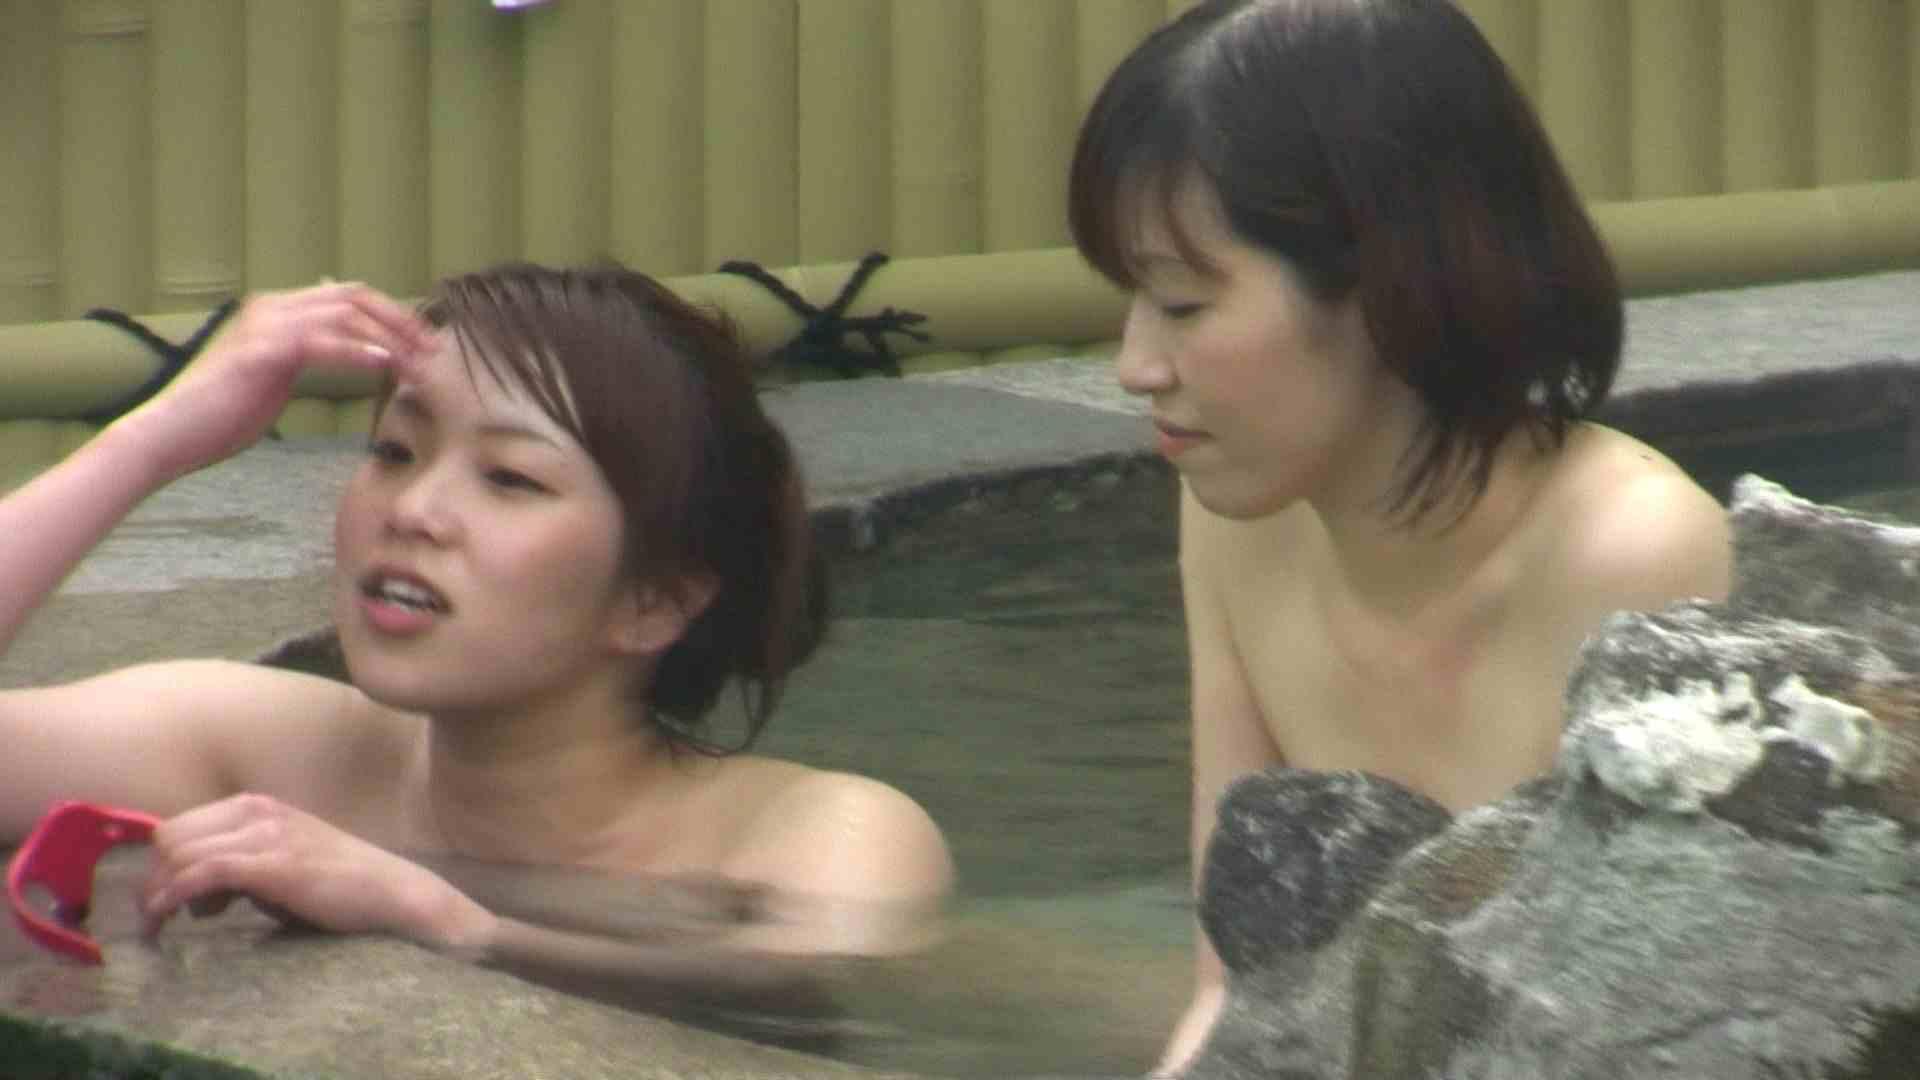 Aquaな露天風呂Vol.680 盗撮特撮   OLのプライベート  13pic 1